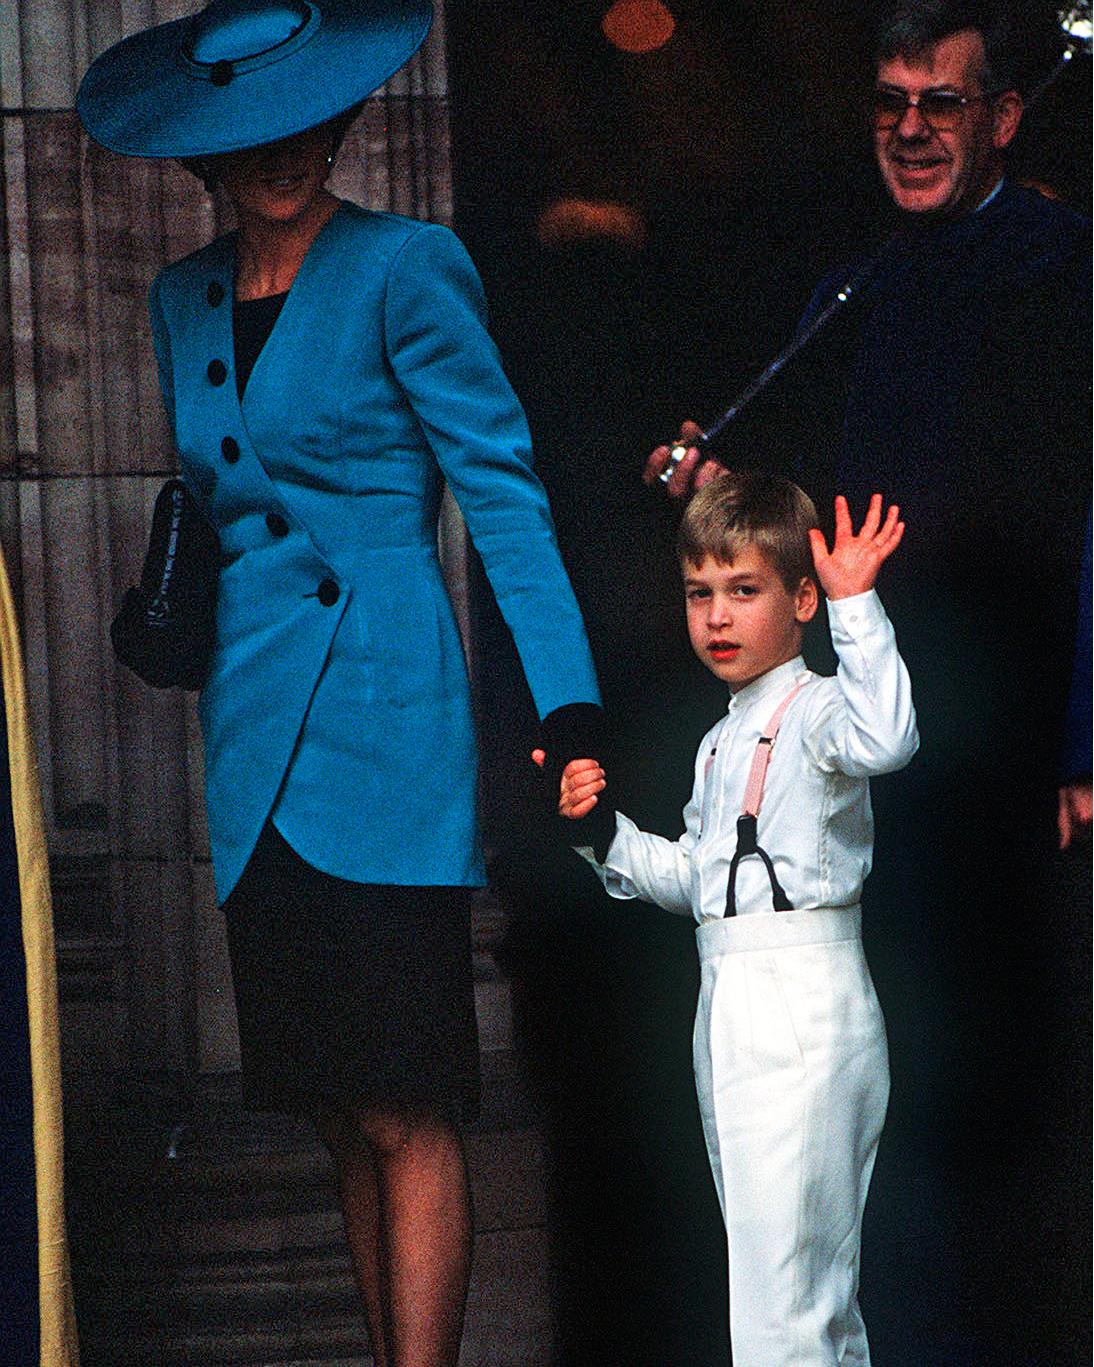 royal-children-wedding-186083556_master-0415.jpg